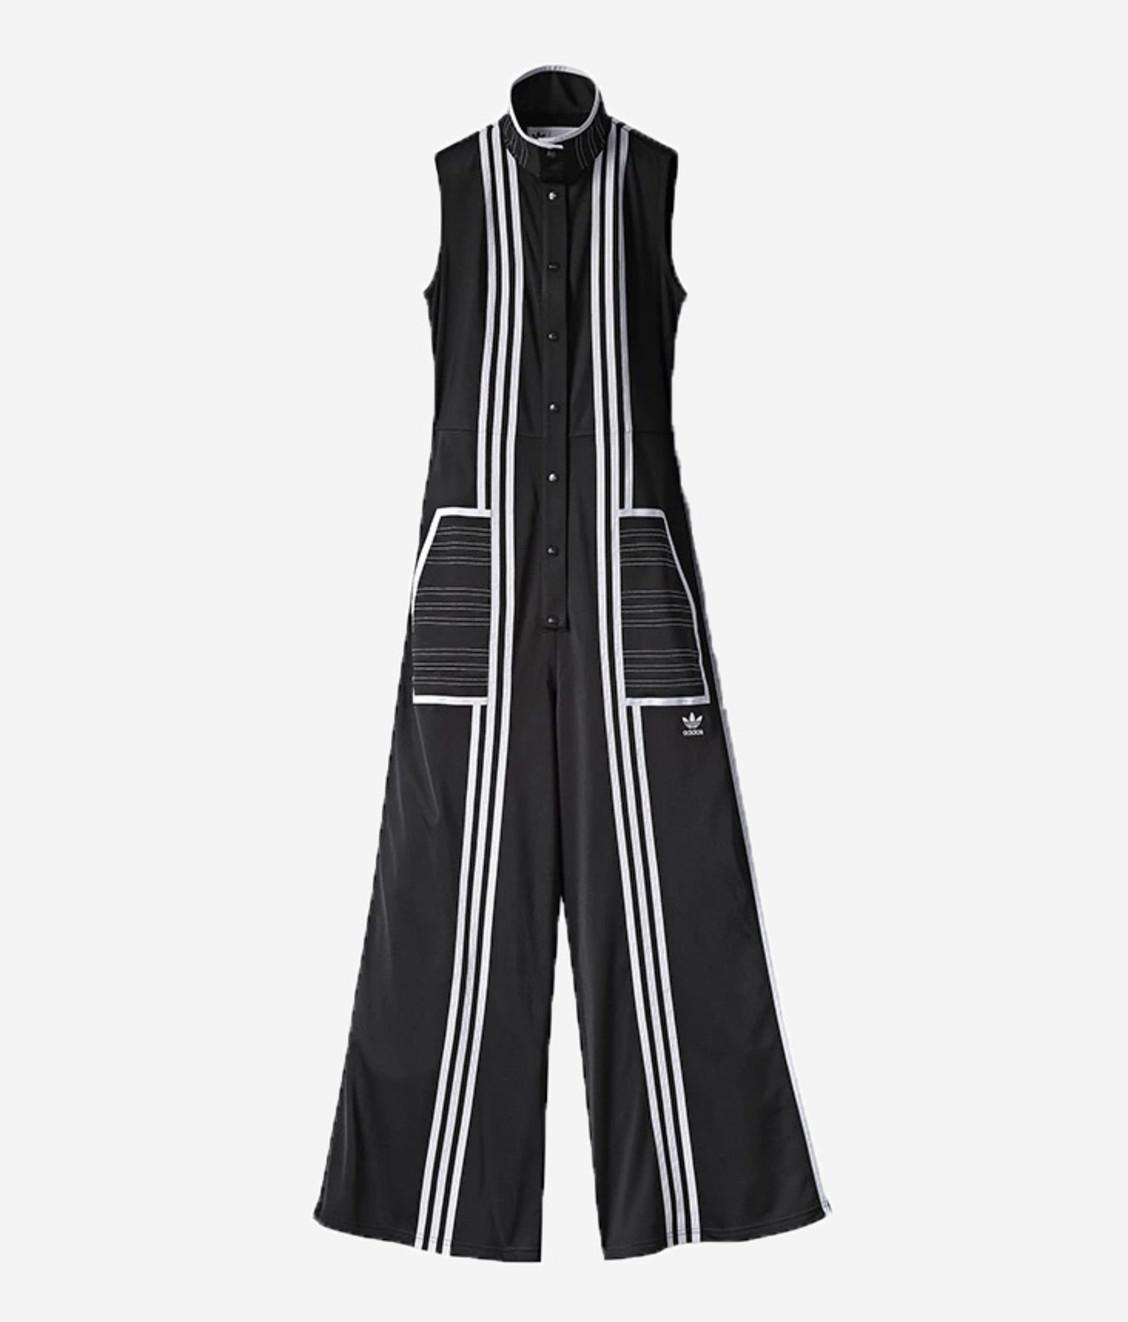 Adidas Adidas Ji Won Choi Jumpsuit Black